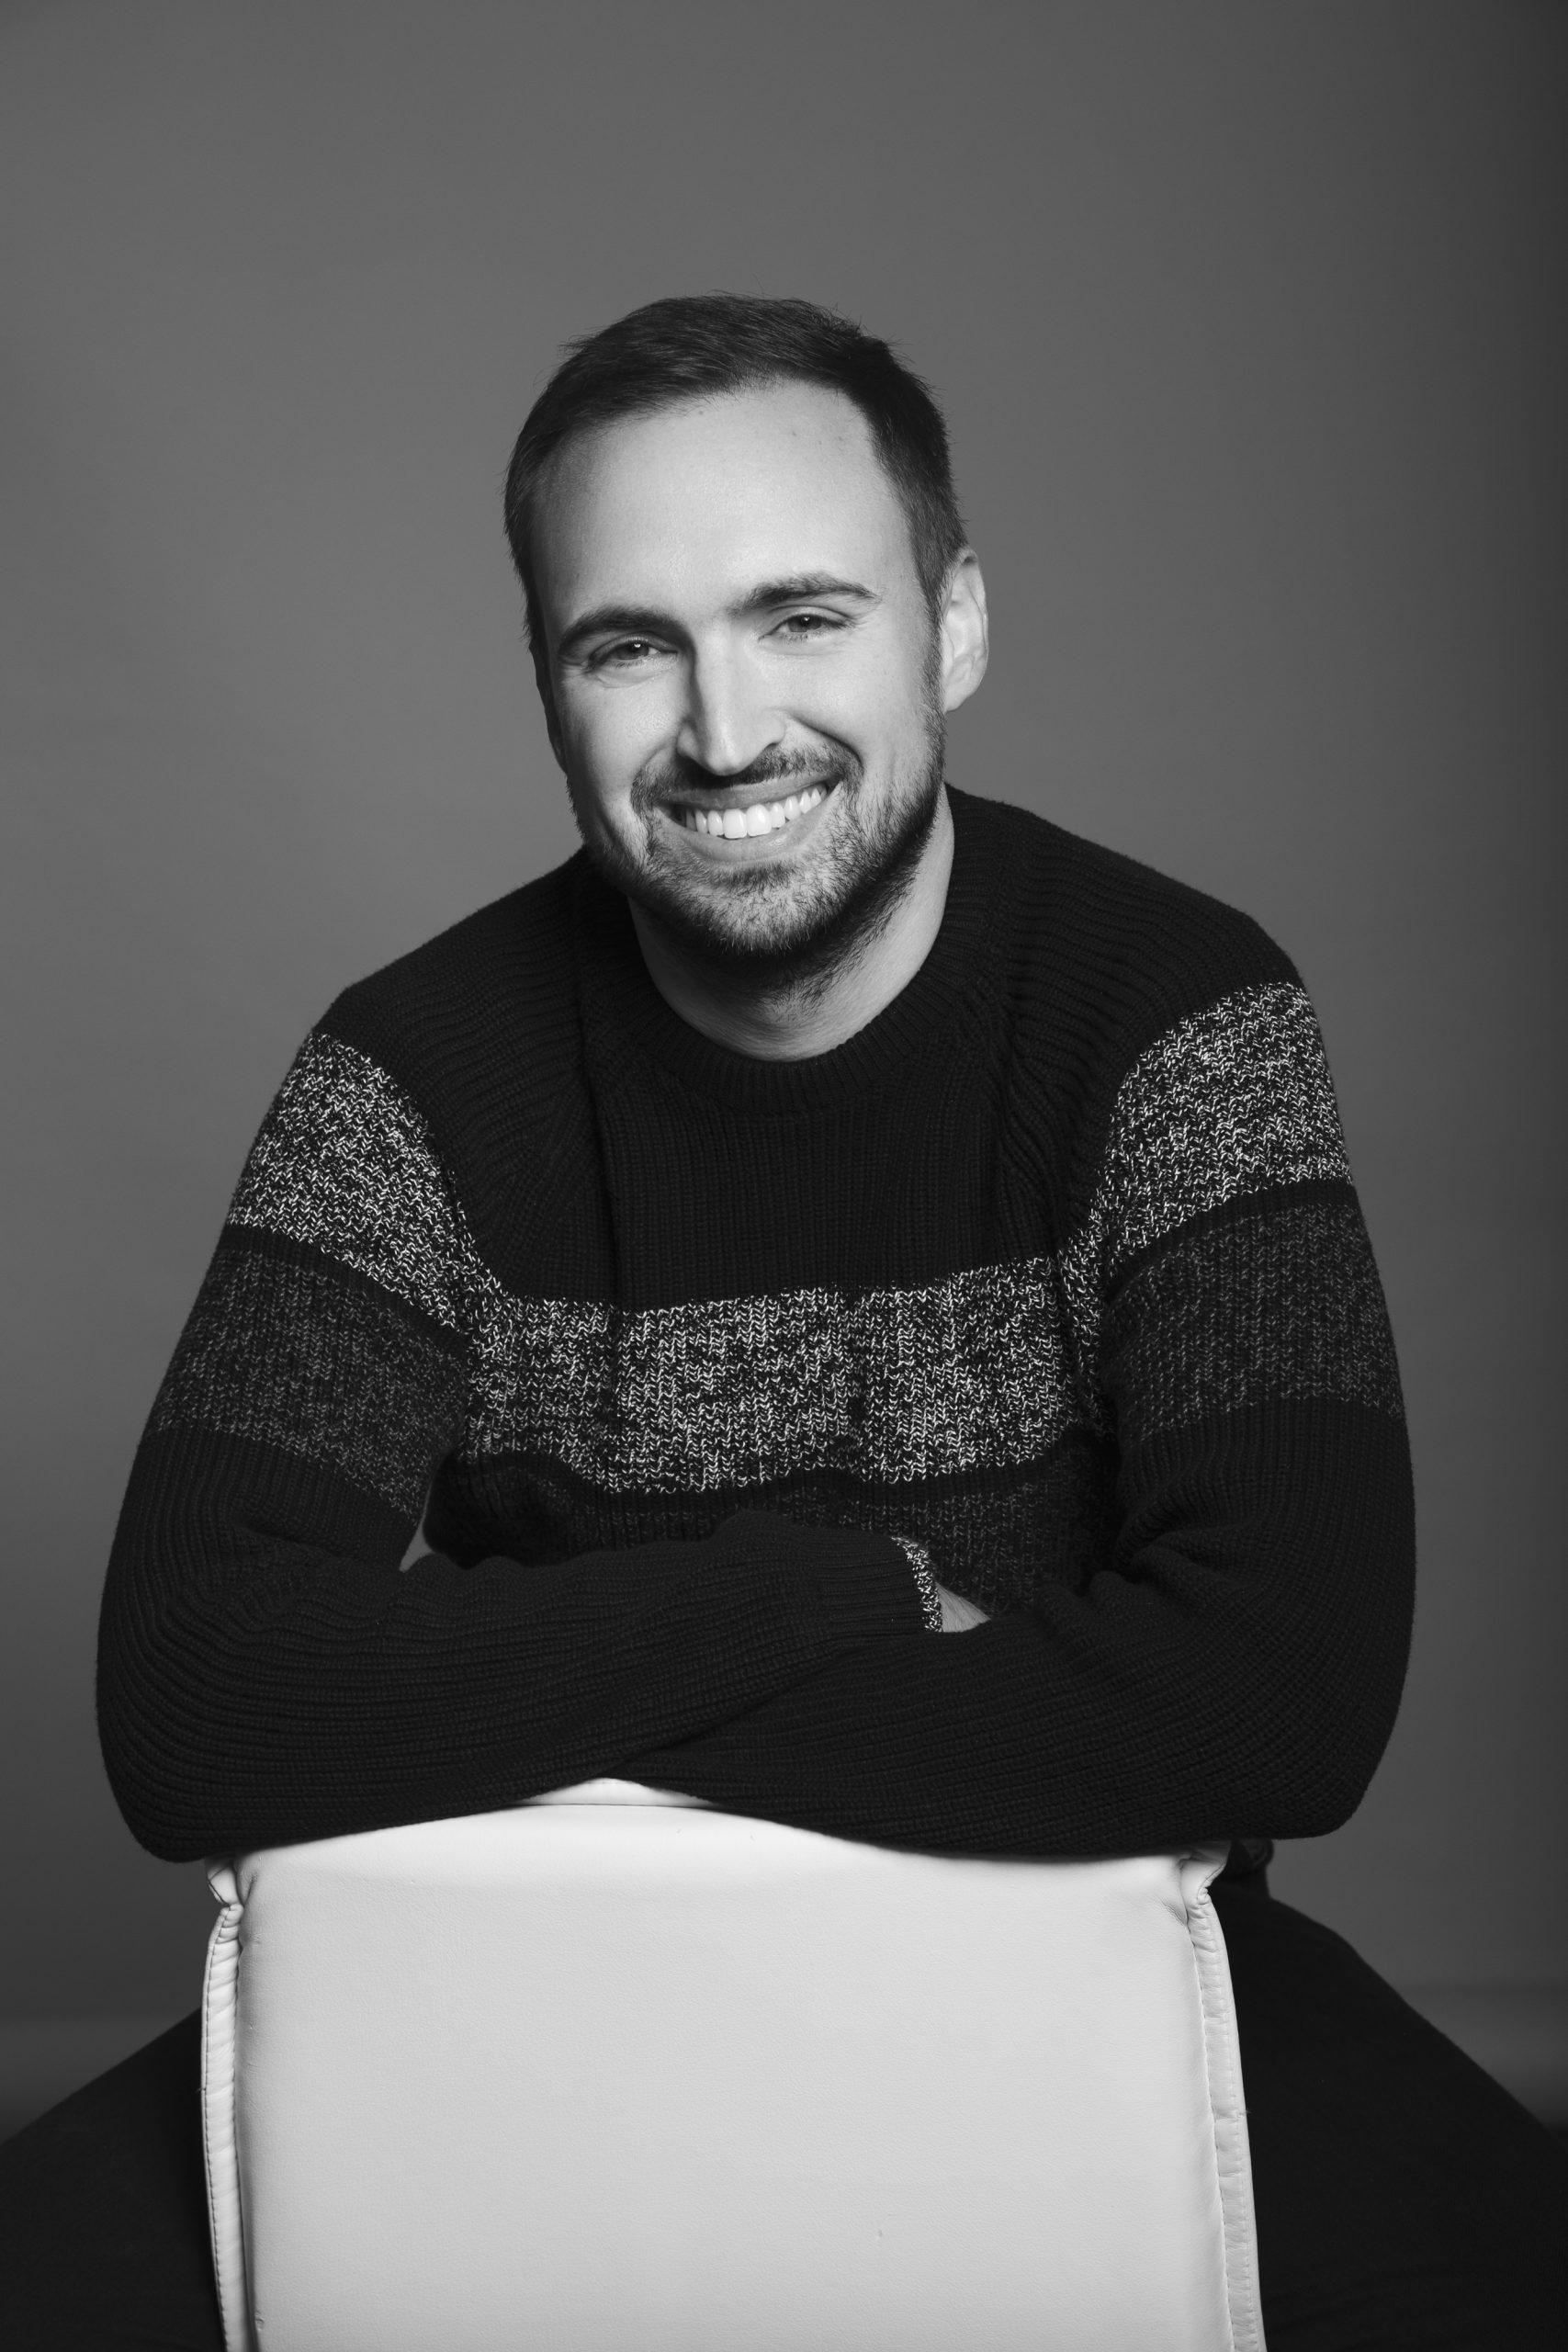 Dušan Veselinović